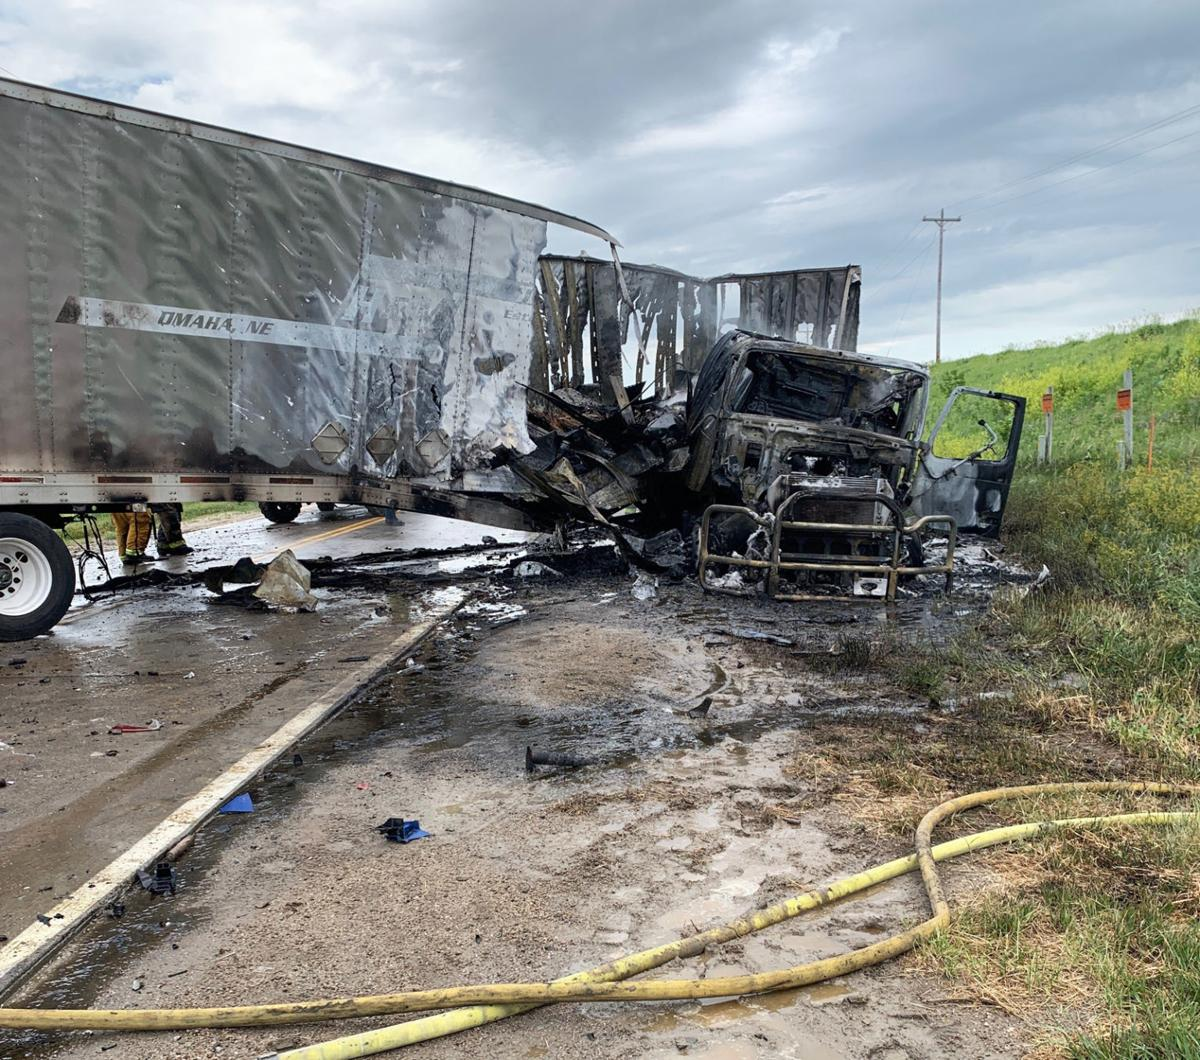 2020 semi fire near Uehling